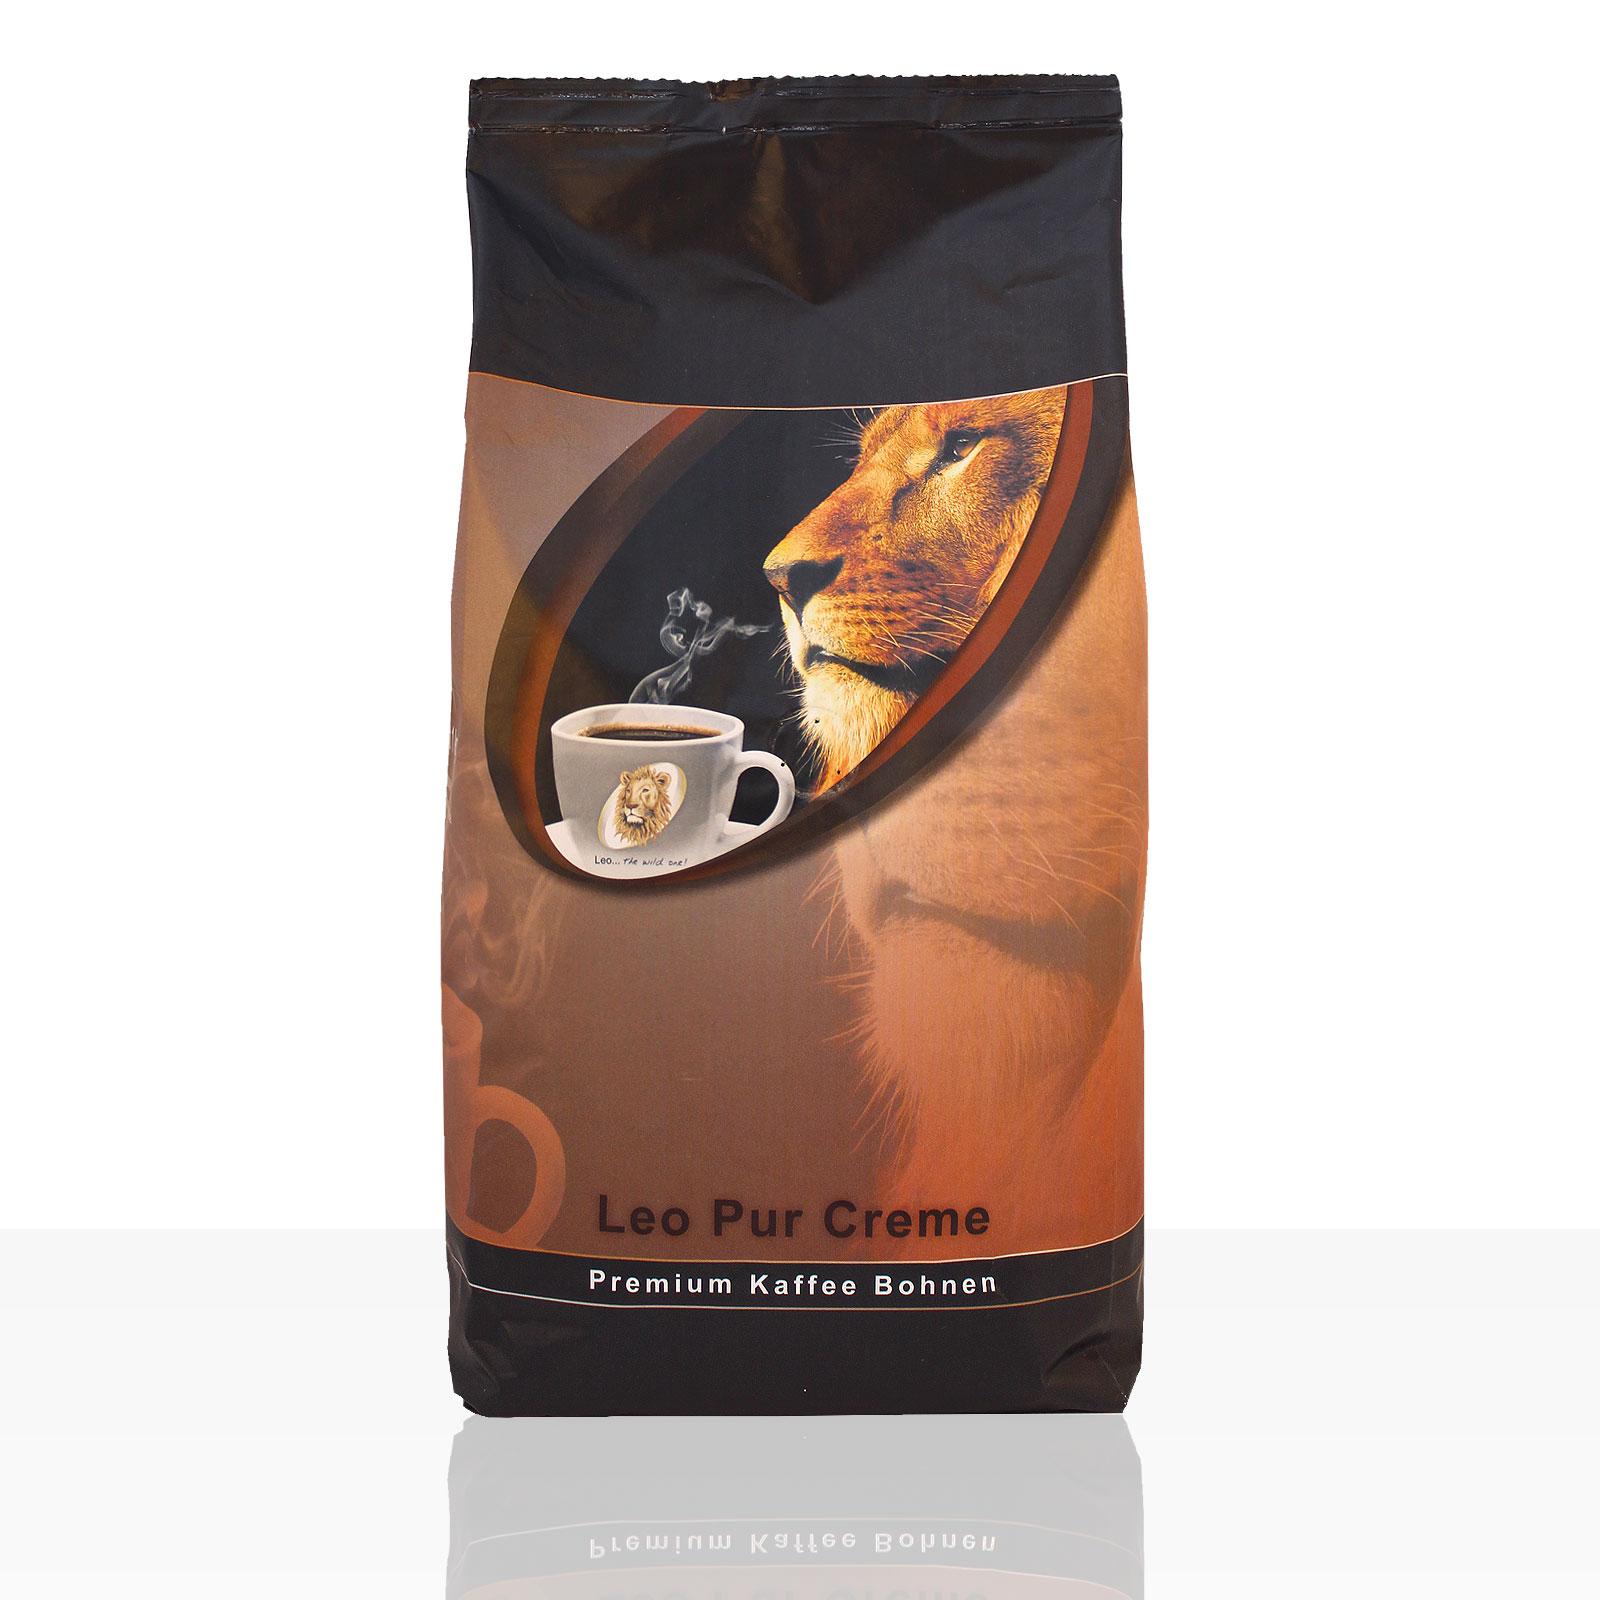 Coffeefair Edition Leo Pur Creme - 8 x 1kg ganze Kaffee-Bohne, Premium Qualität